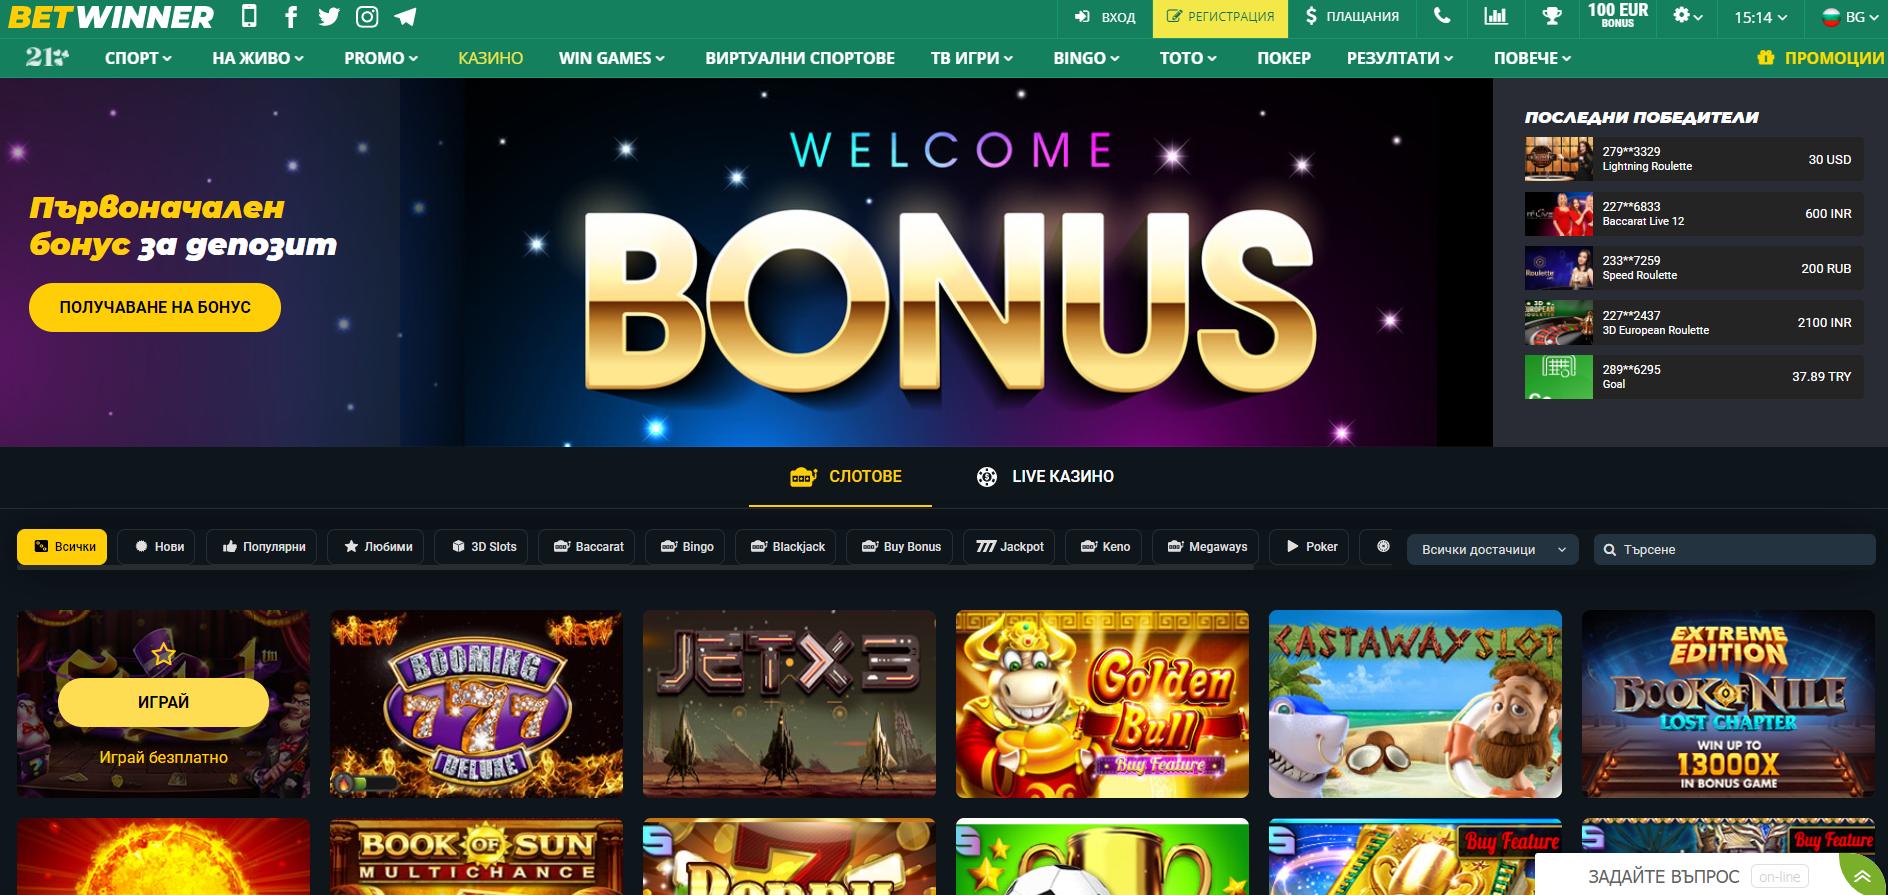 betwinner casino-komarbet.com